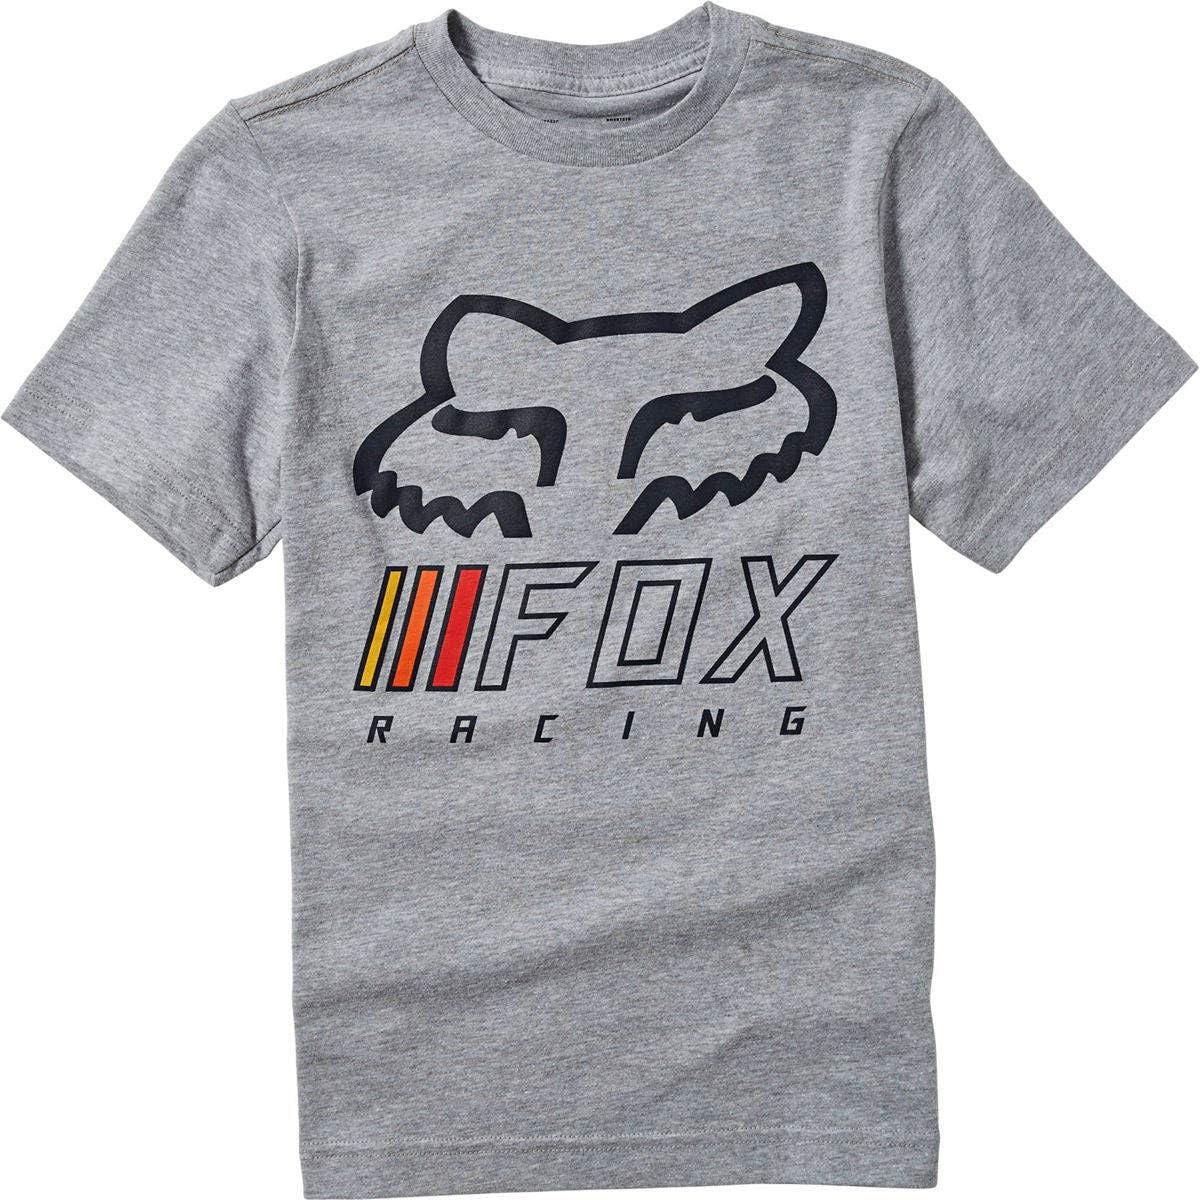 Fox Unisex Youth Overhaul Ss Tee Light Heather Grey Tees